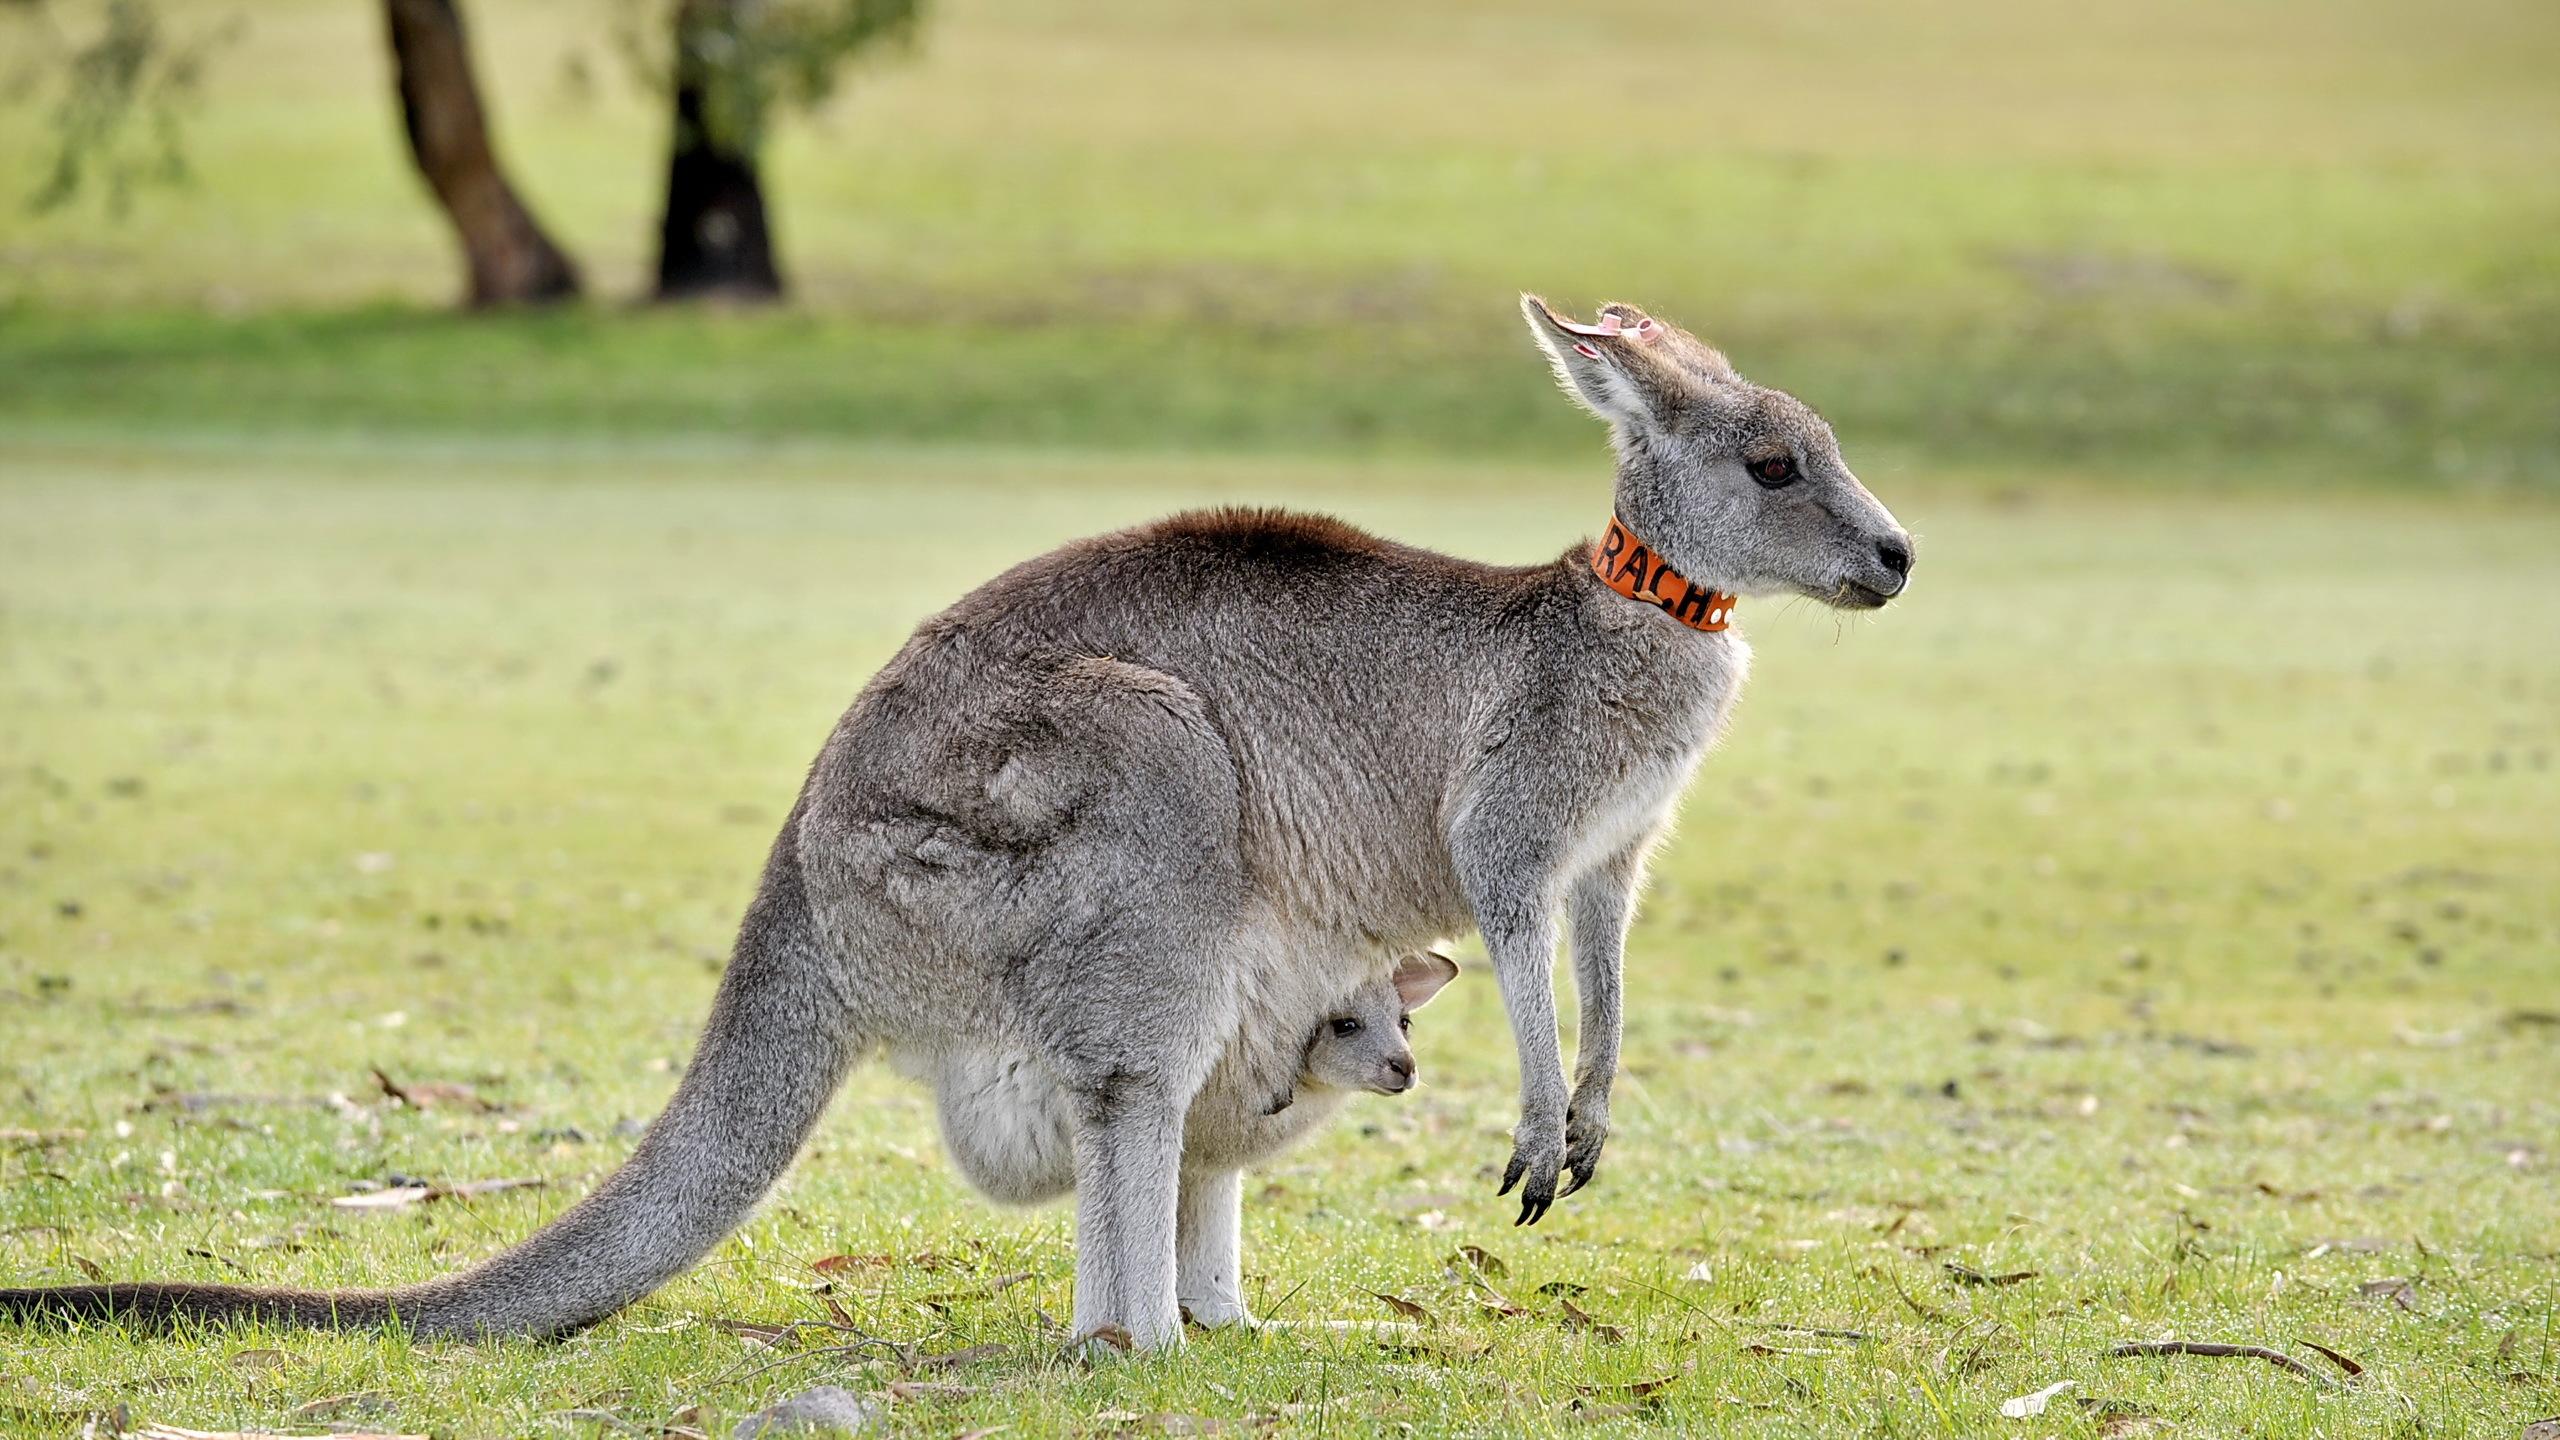 how to get a kangaroo as a pet in australia